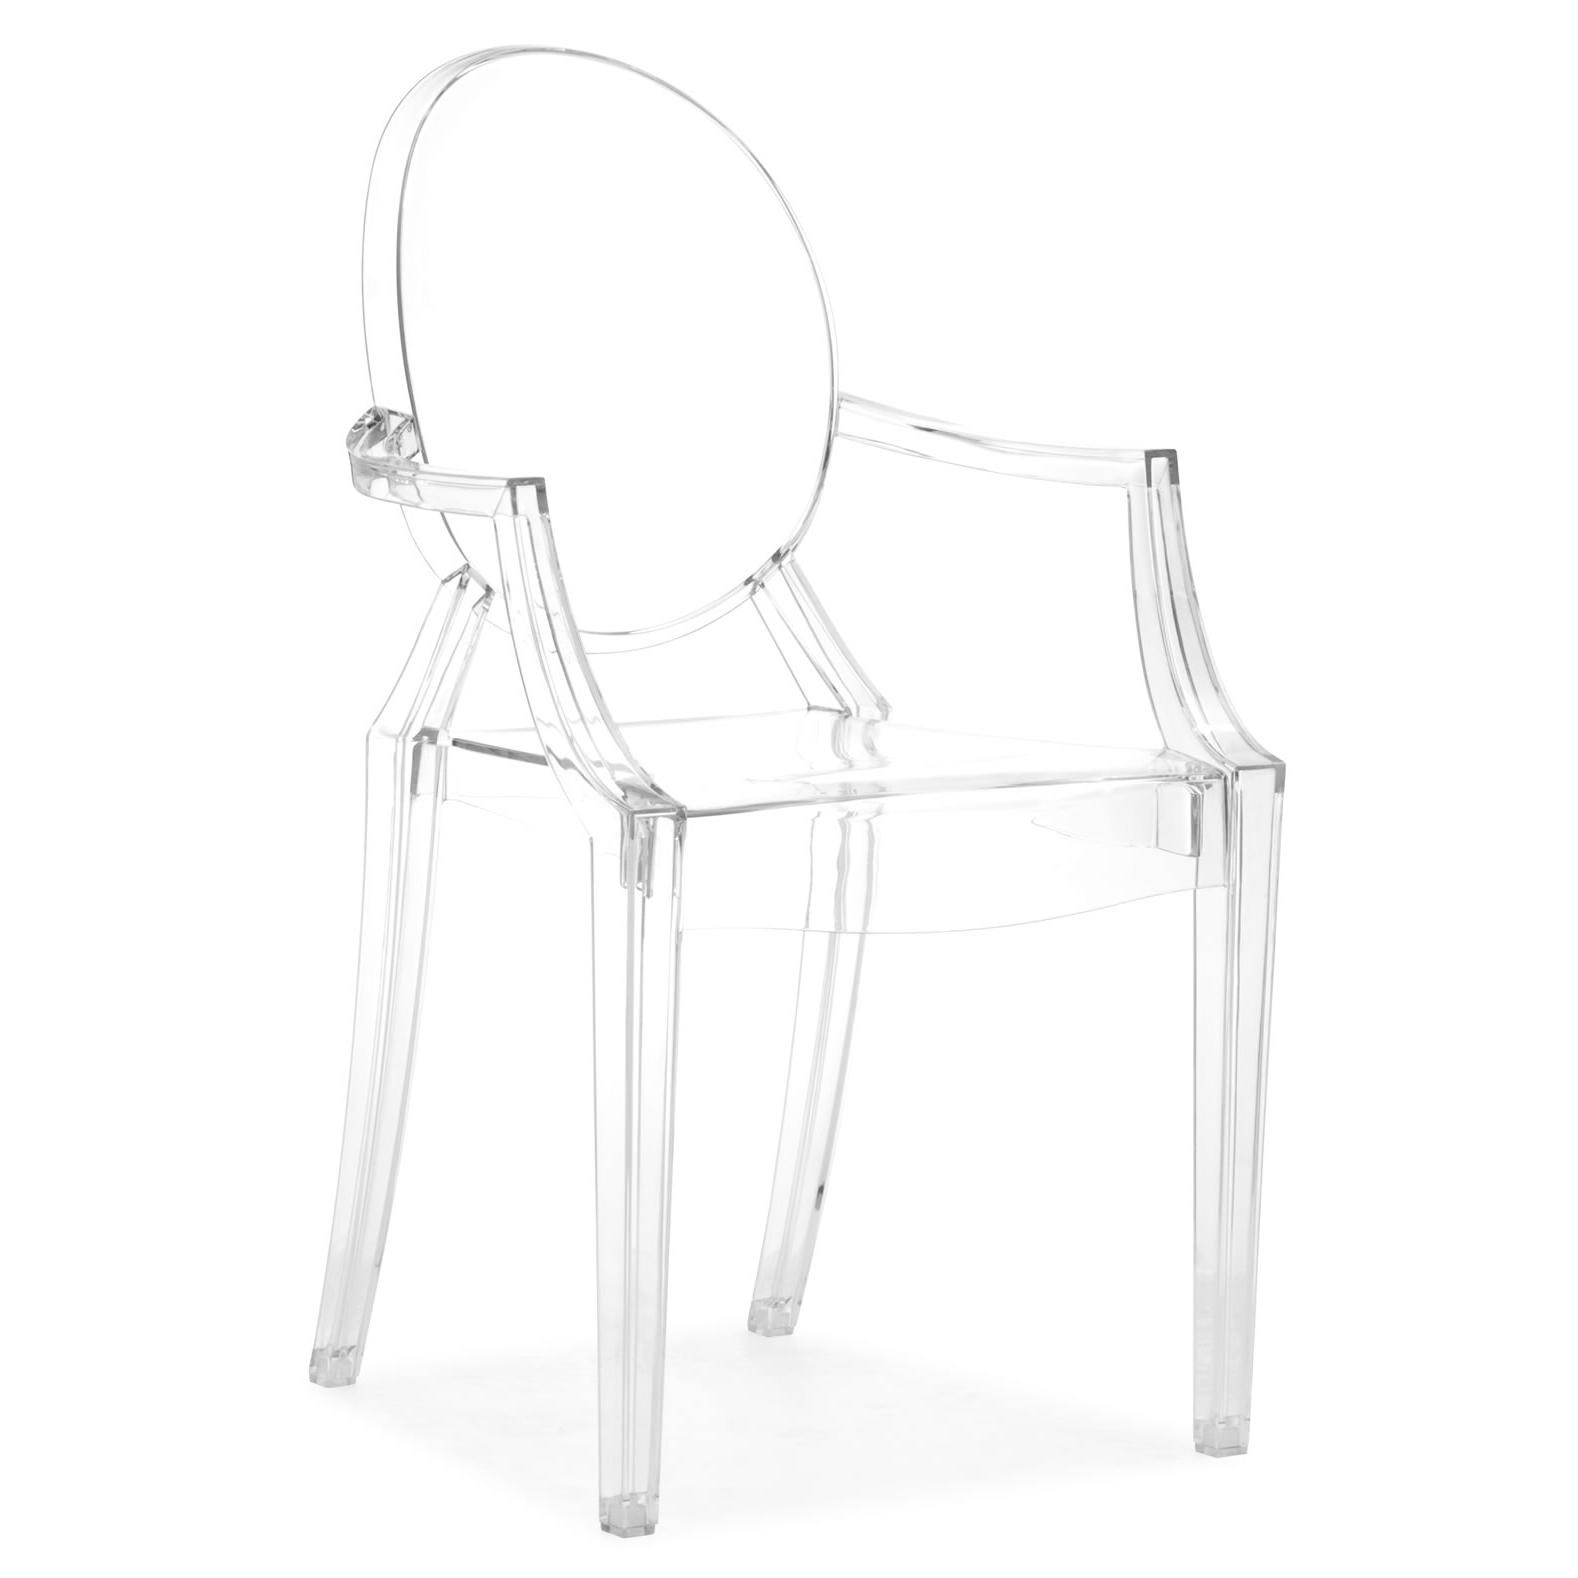 Zuo BarAnime Acrylic Chair Set Of 5